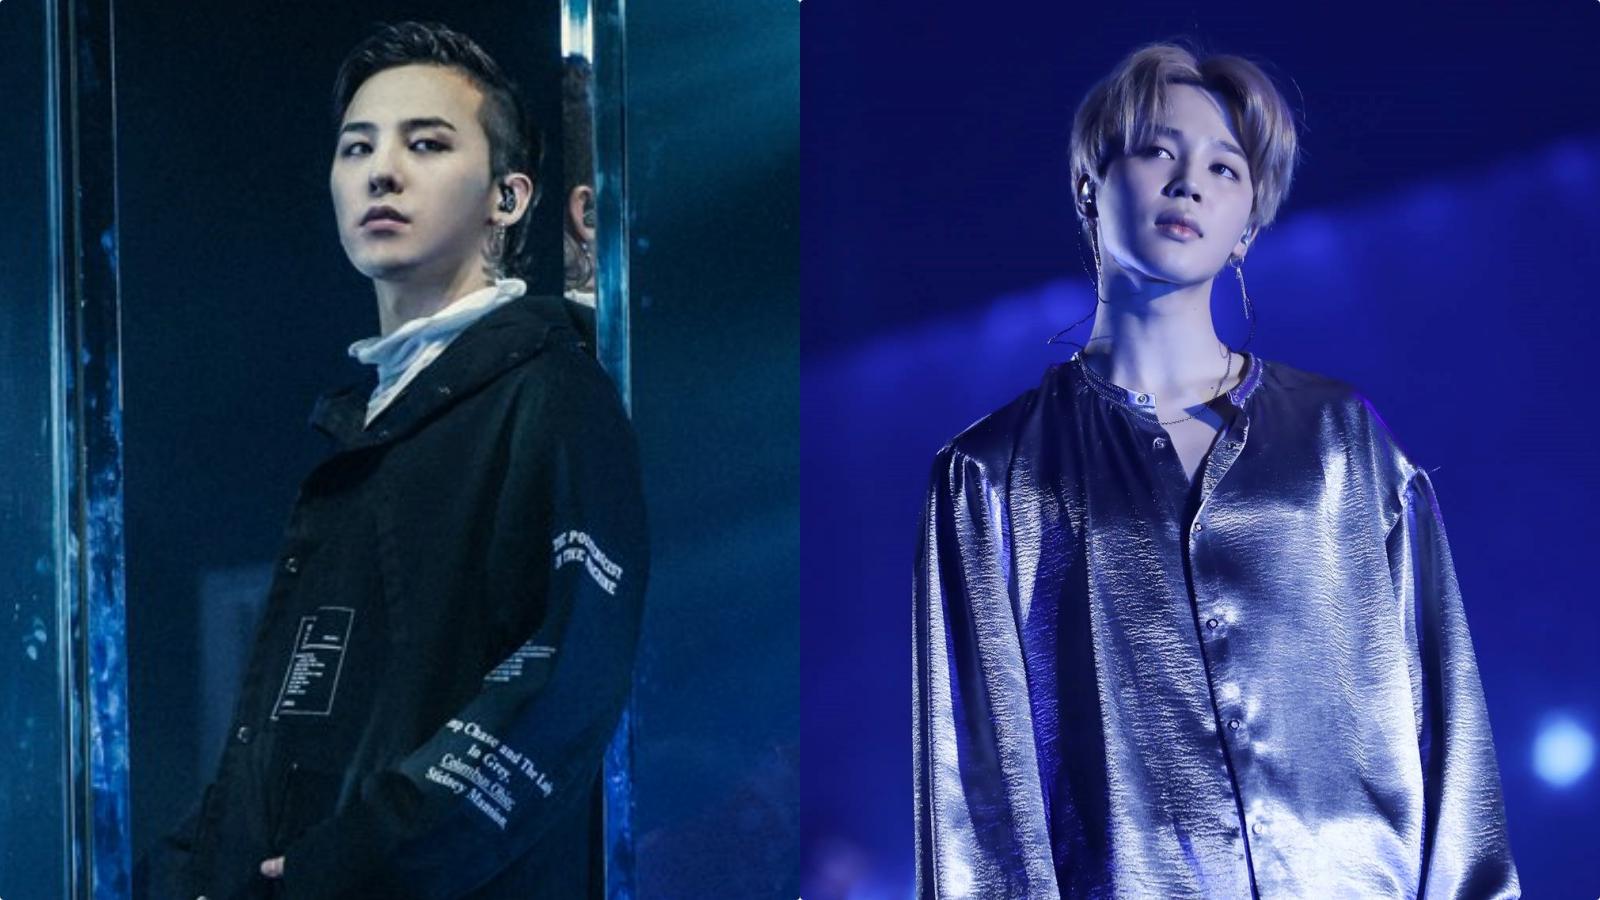 G-Dragon dan Jimin BTS, Anggota Boyband K-Pop Terbaik Versi Guardian